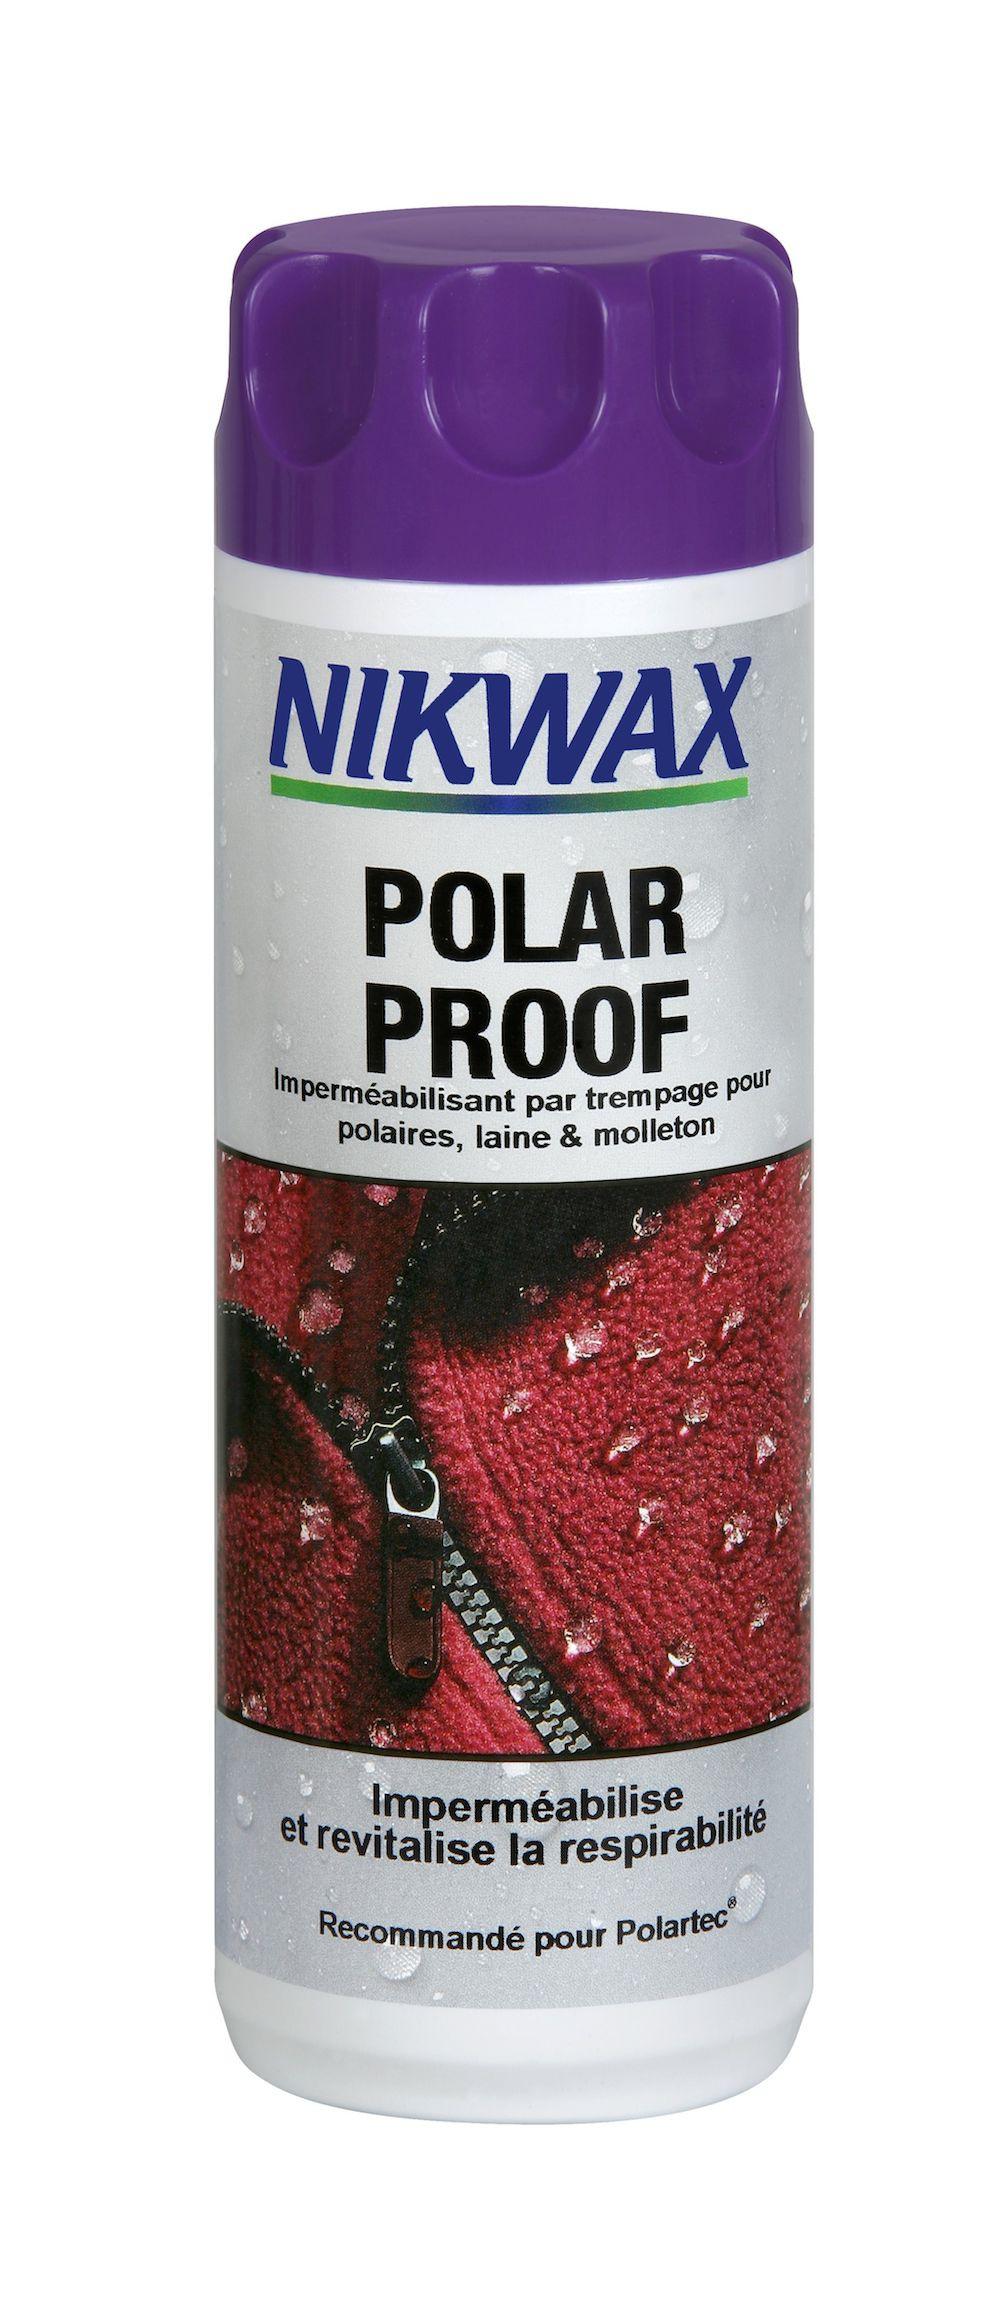 Nikwax - Polar Proof - Dry treatment